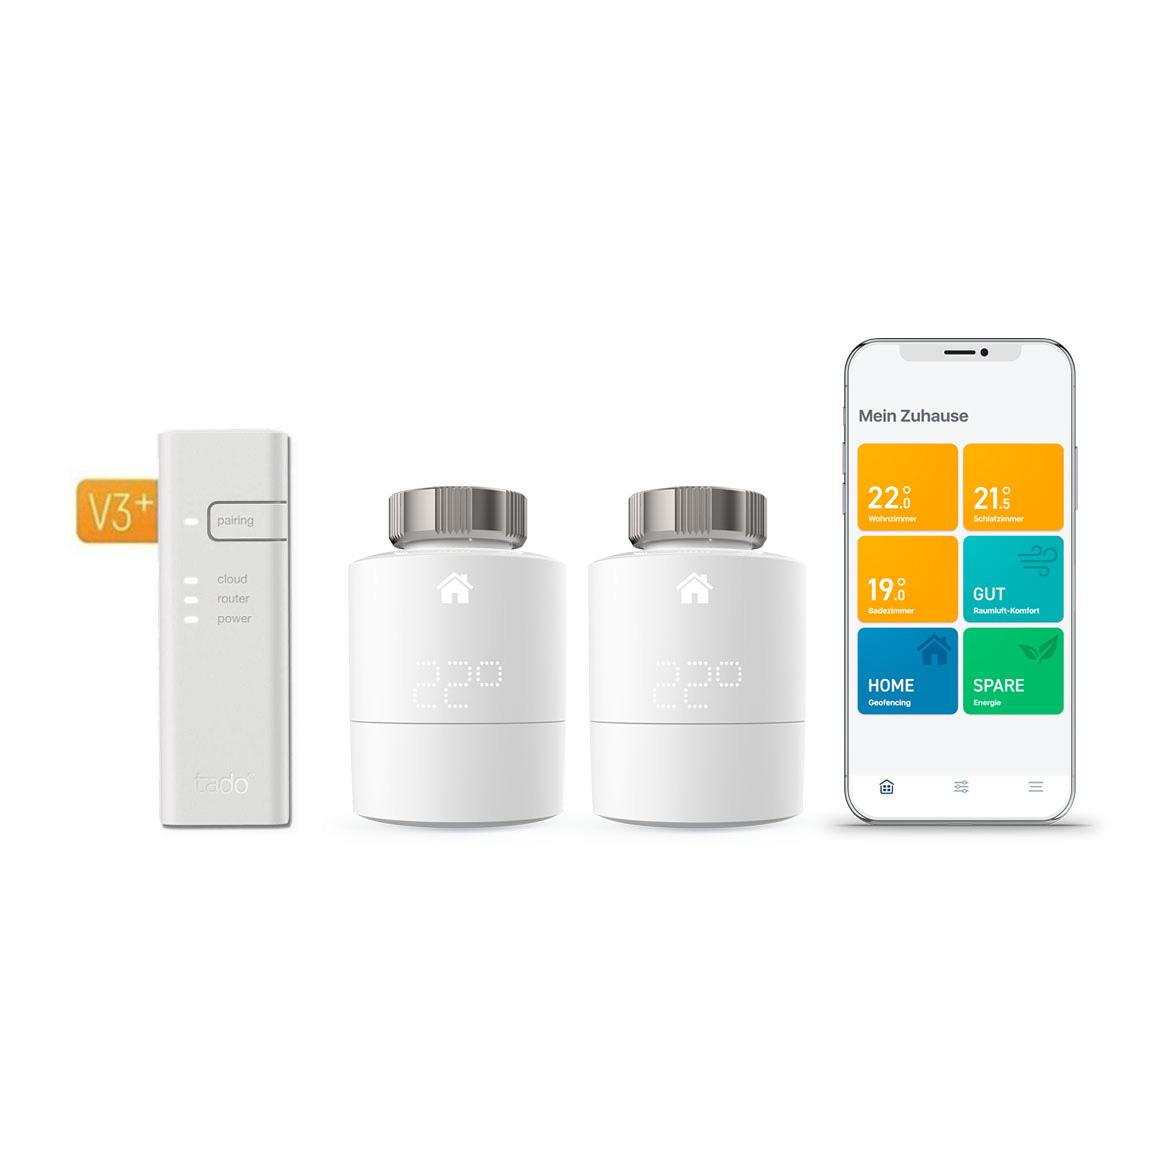 tado° Smartes Heizkörper-Thermostat Starter Kit V3+ mit 2 Thermostaten und Bridge